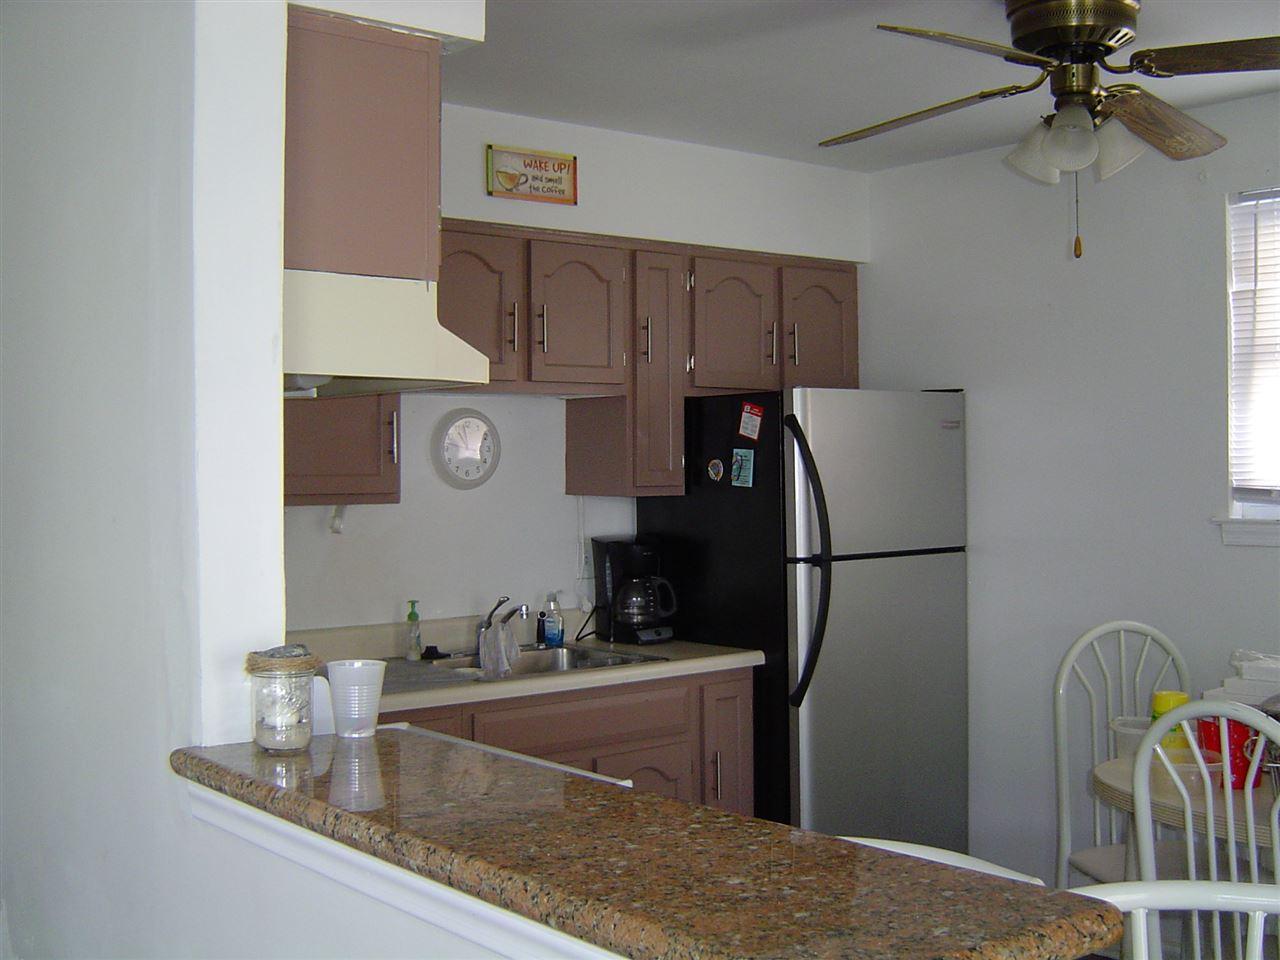 314 E 19th Avenue 1st #1ST, North Wildwood, NJ 08260